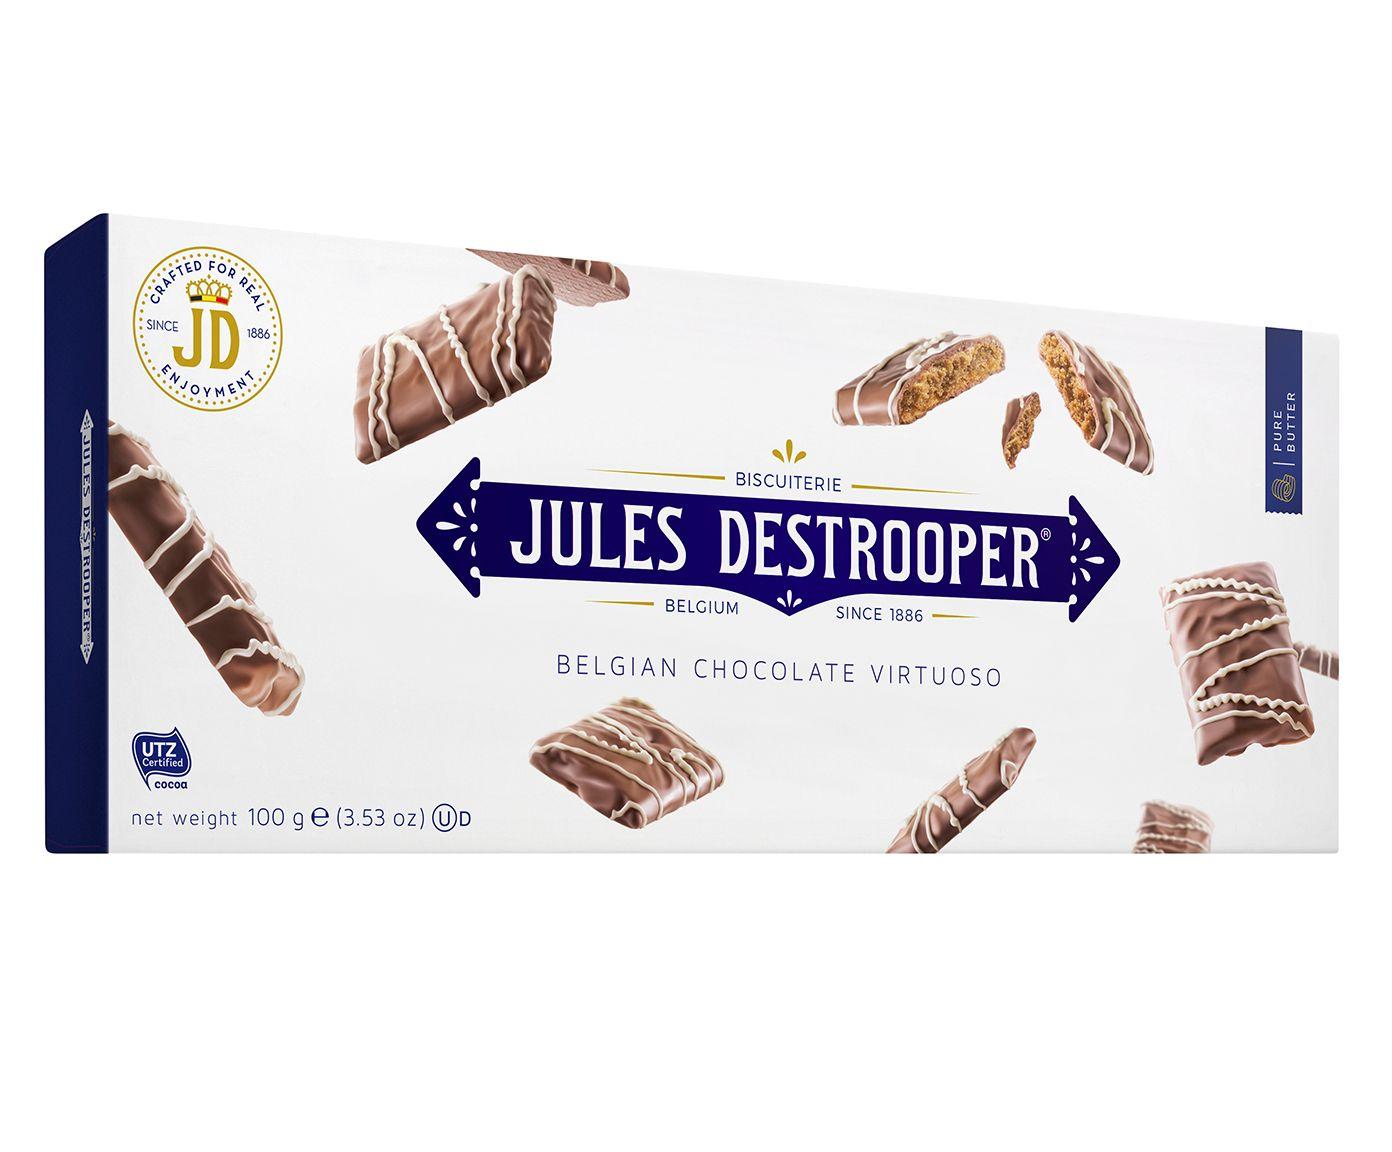 Biscoito Belga Jules D. Belgagian Chocolate Virtuoso - 100G   Westwing.com.br